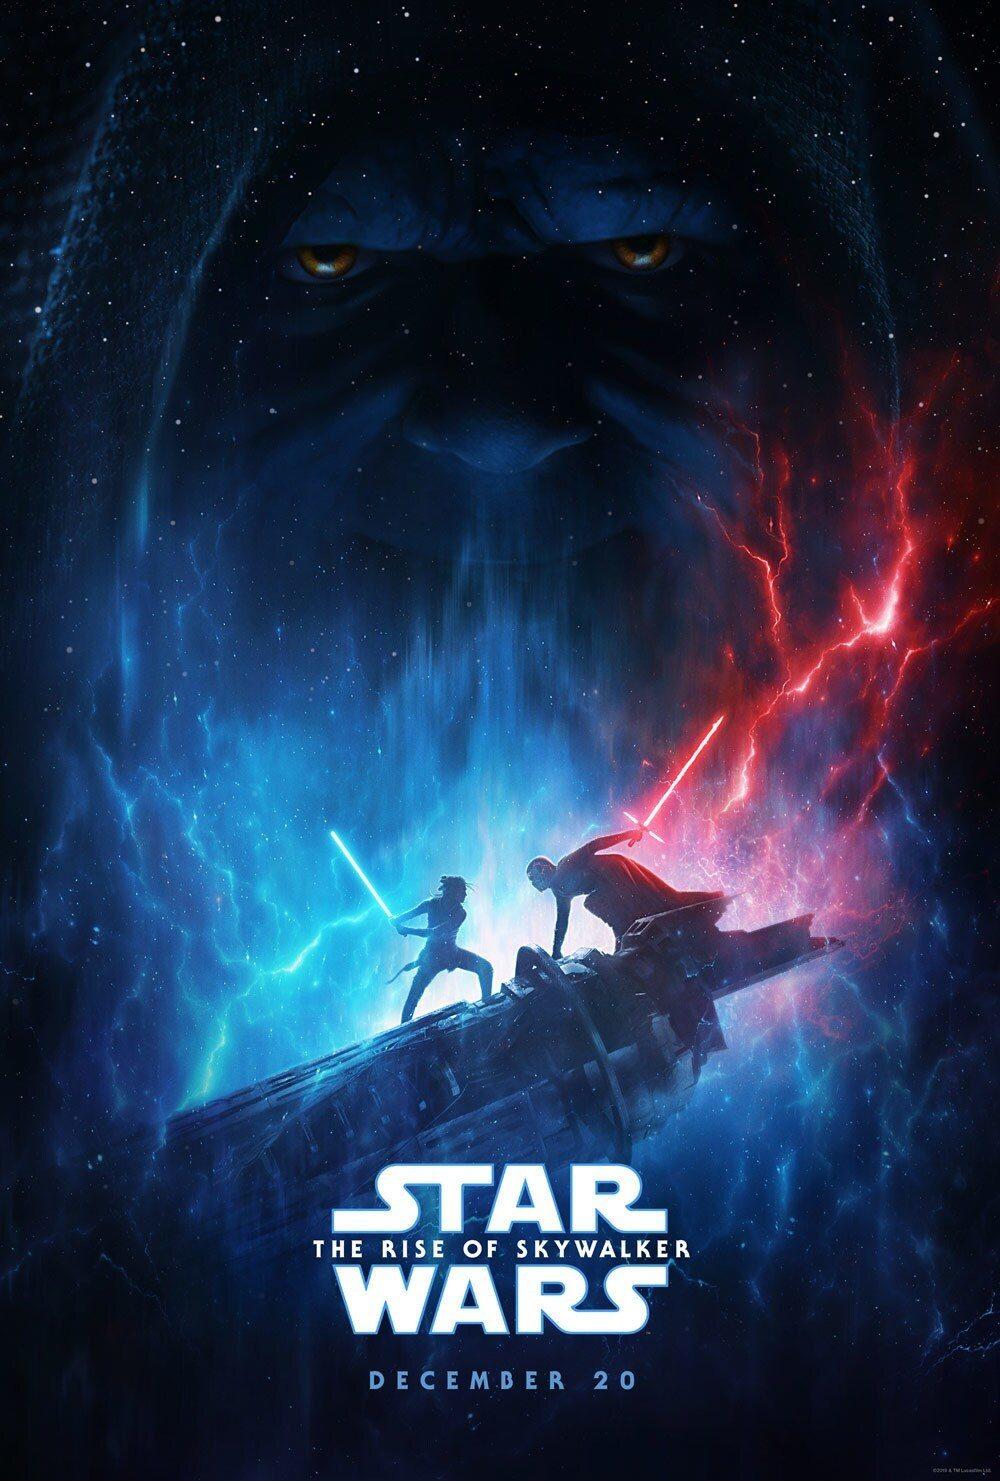 Star Wars, Kevin Feige, Brie Larson, Chris Evans